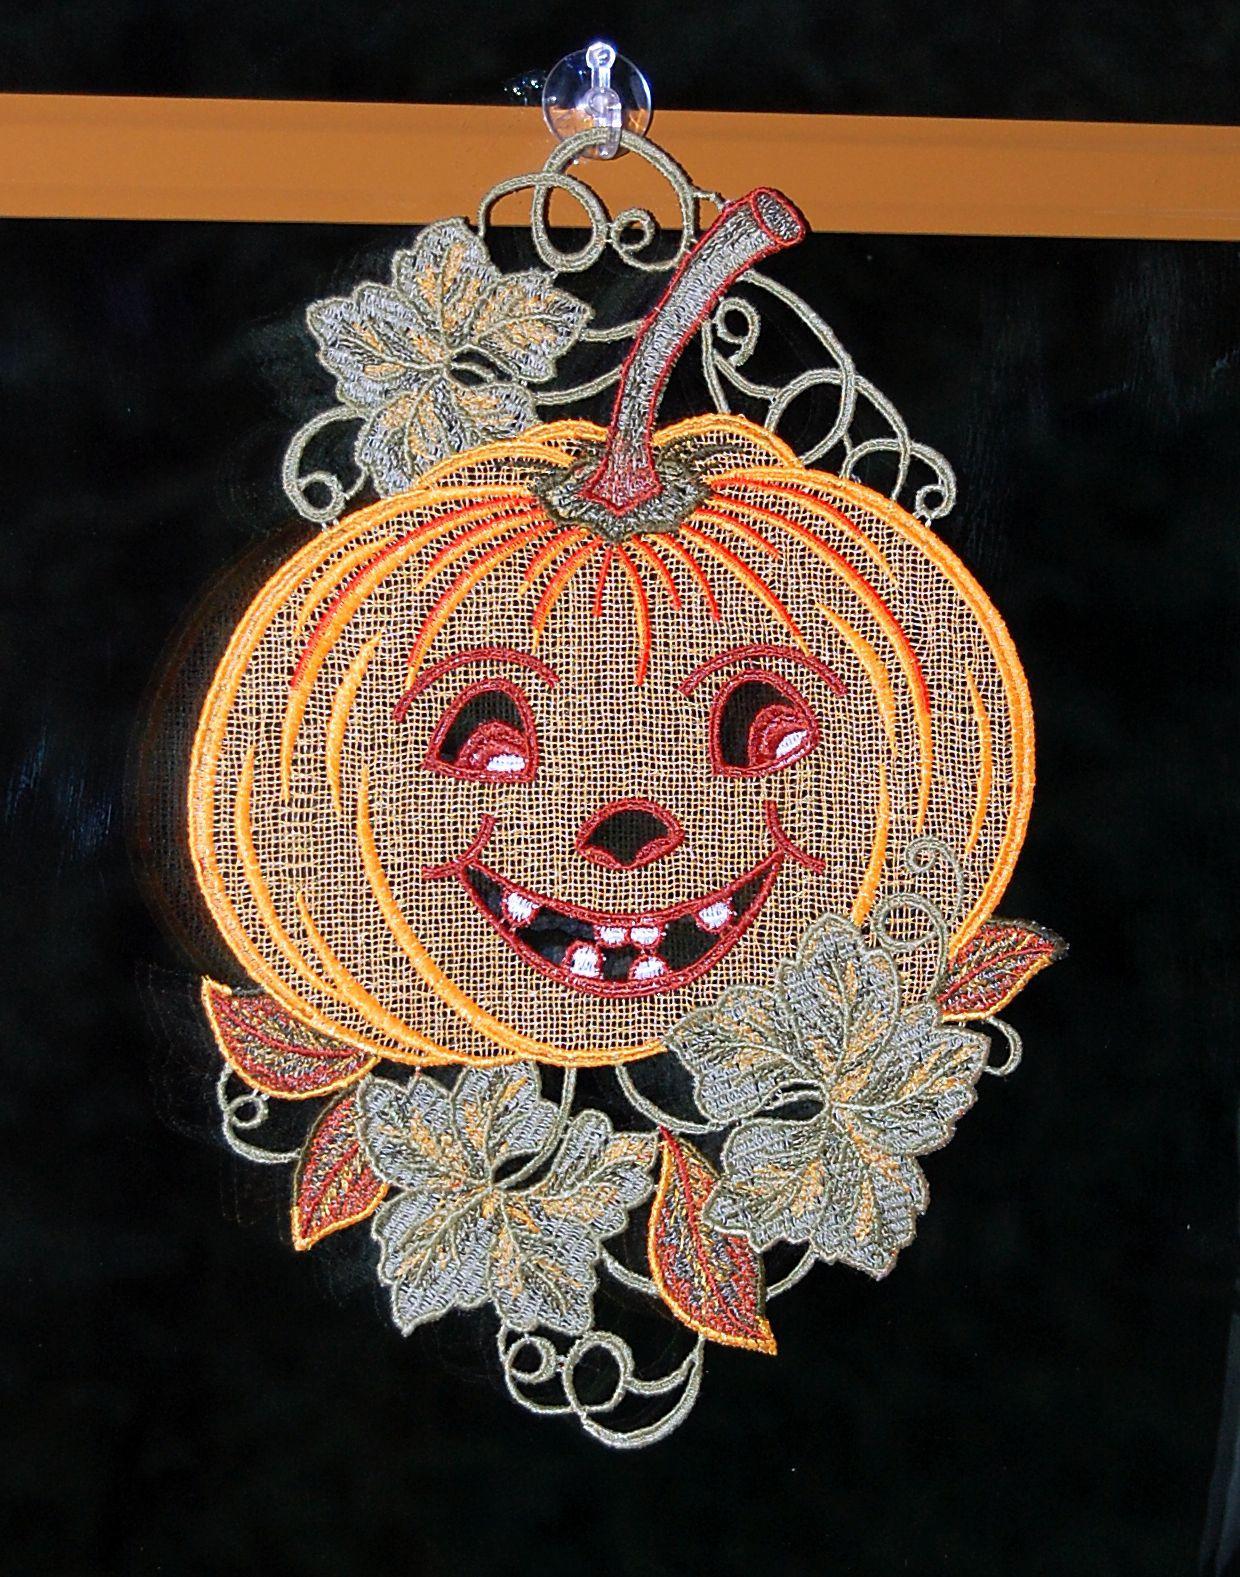 fensterbild 21x28 cm saugnapf plauener spitze k rbis orange halloween herbst ebay. Black Bedroom Furniture Sets. Home Design Ideas